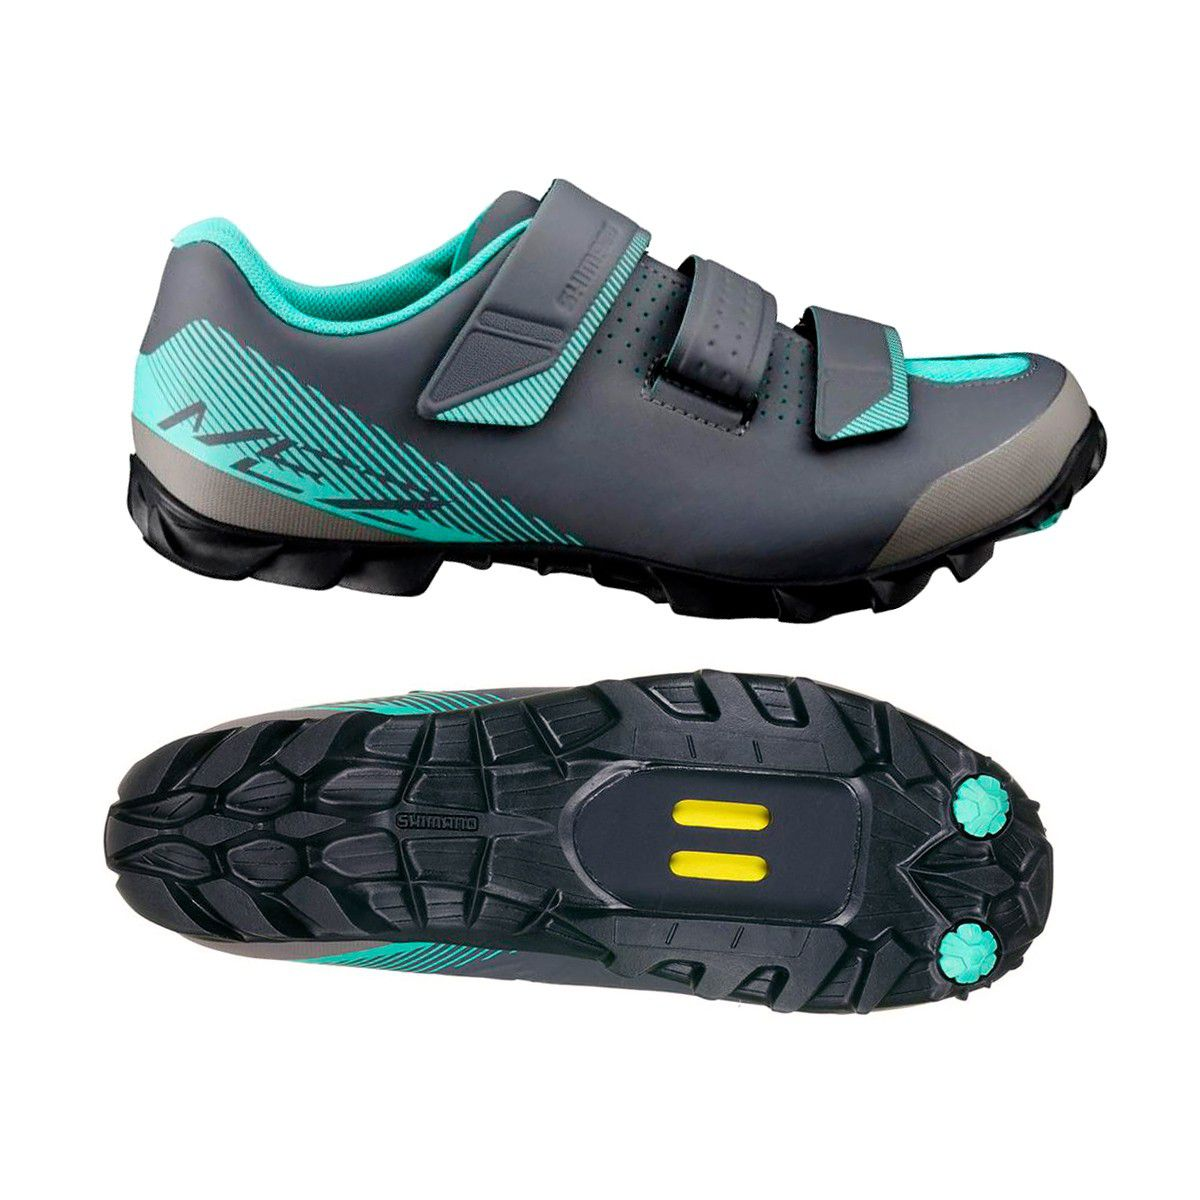 Sapatilha Shimano Feminina SH-ME200 3 Velcros mais pedal M520